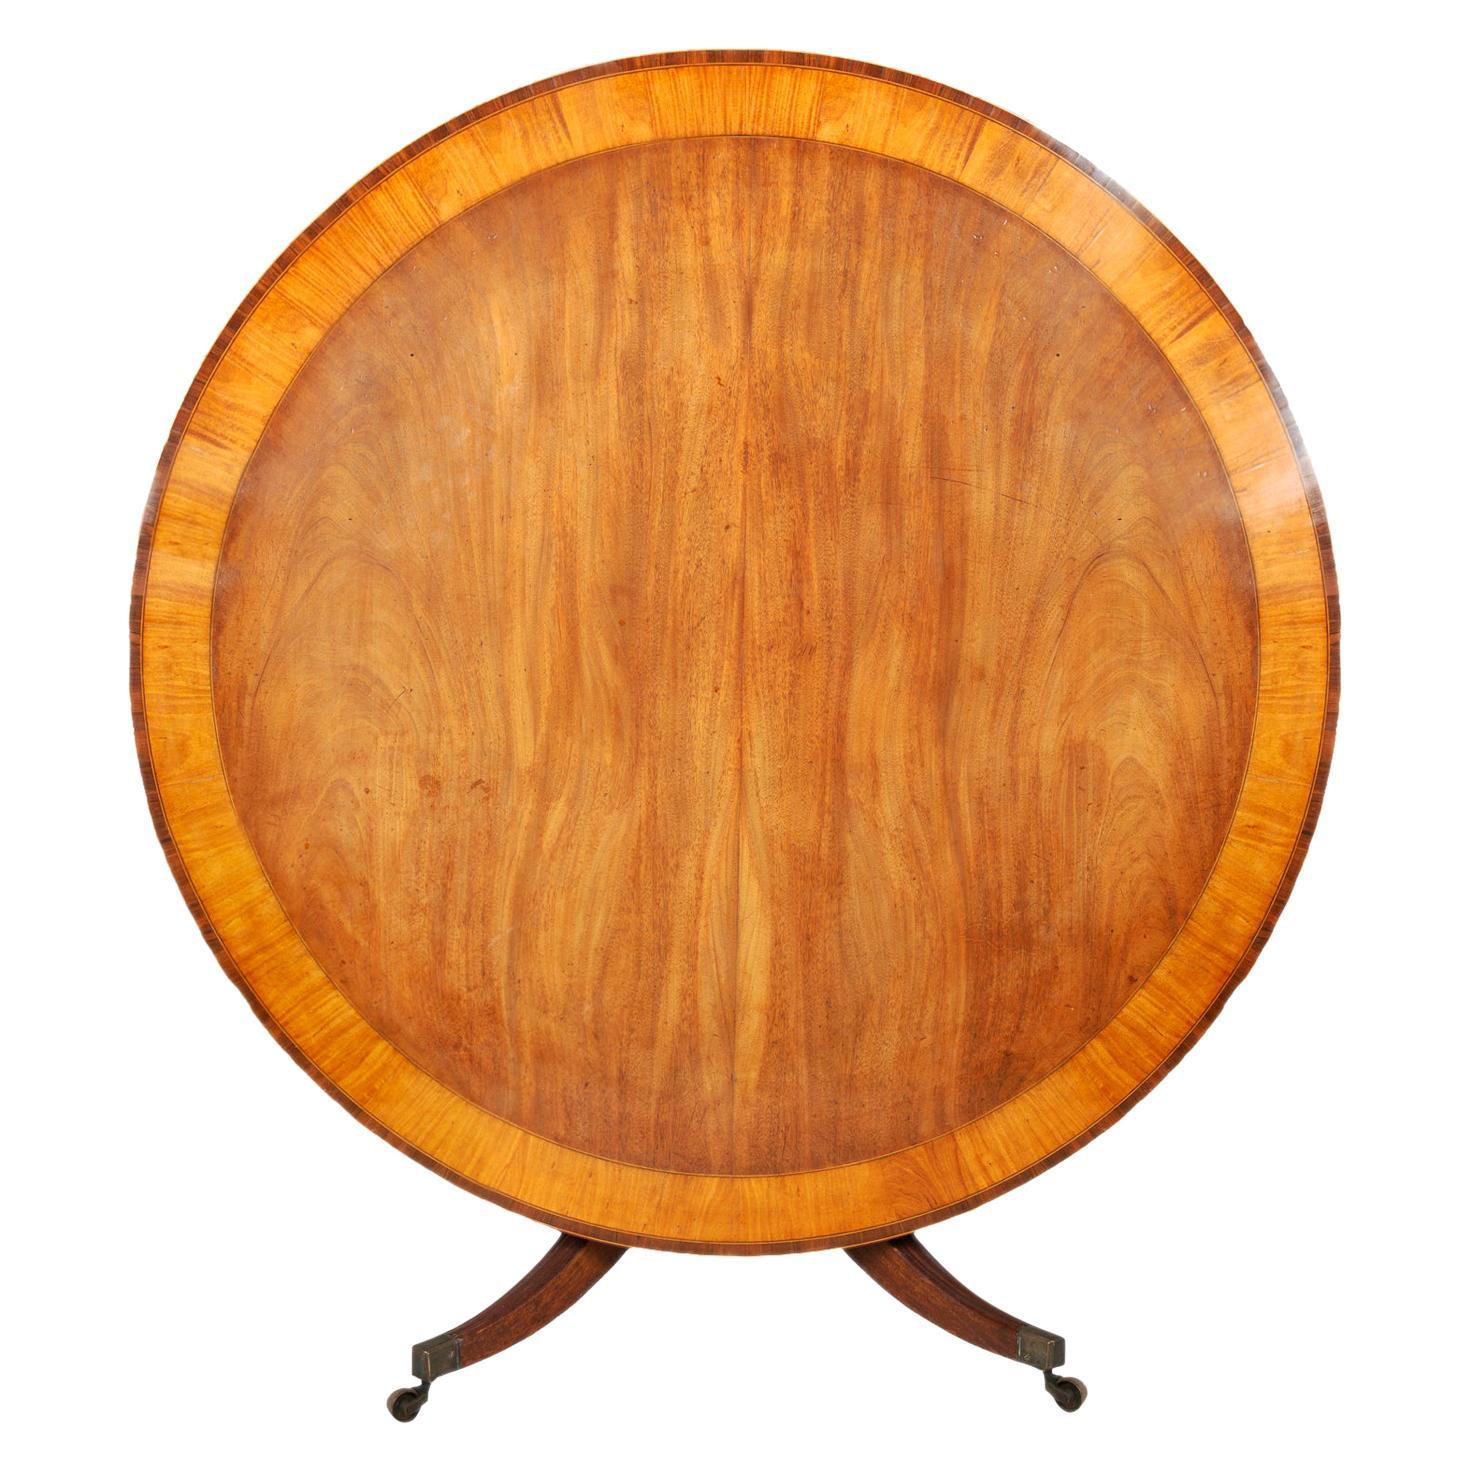 "Large Late Regency Period Mahogany Circular Dining Table 150cm(59"") diameter"